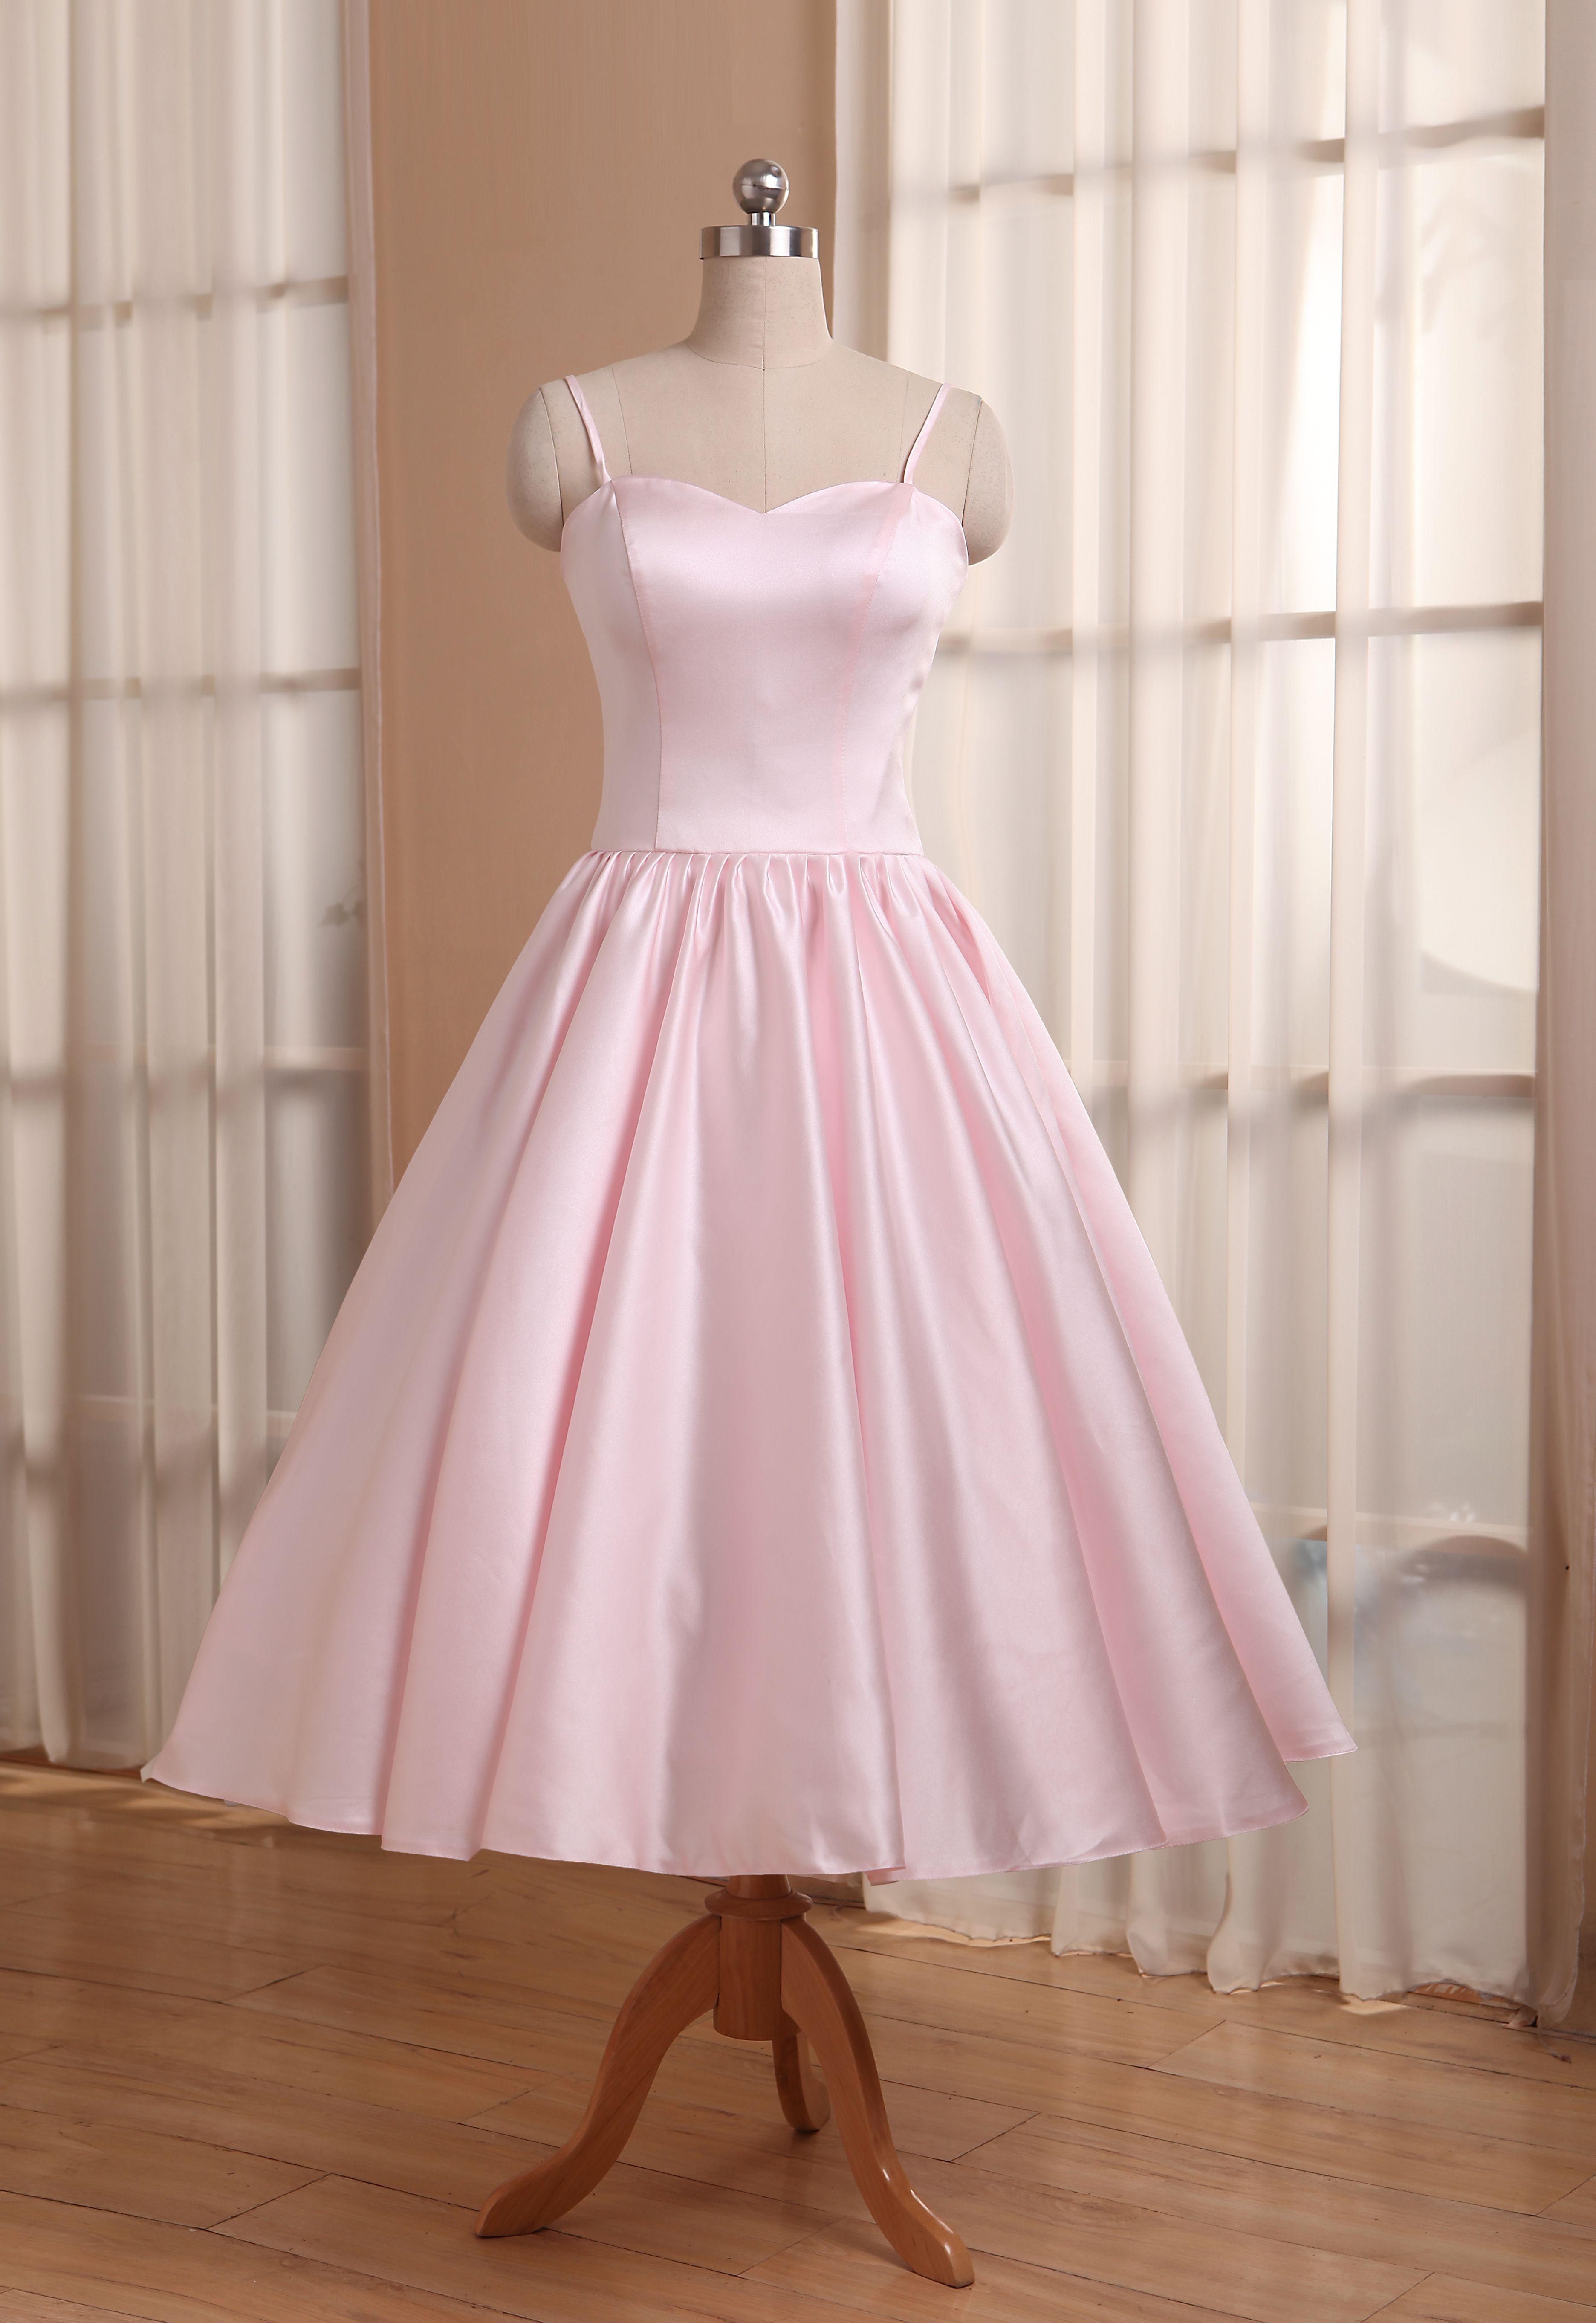 Vintage Short Wedding Dresses Tea Length Bridesmaid Dress Garden Bridal Party Pink Tea Length Bridesmaid Dresses Tea Length Dresses Plus Size Bridesmaids Gowns [ 5448 x 3744 Pixel ]